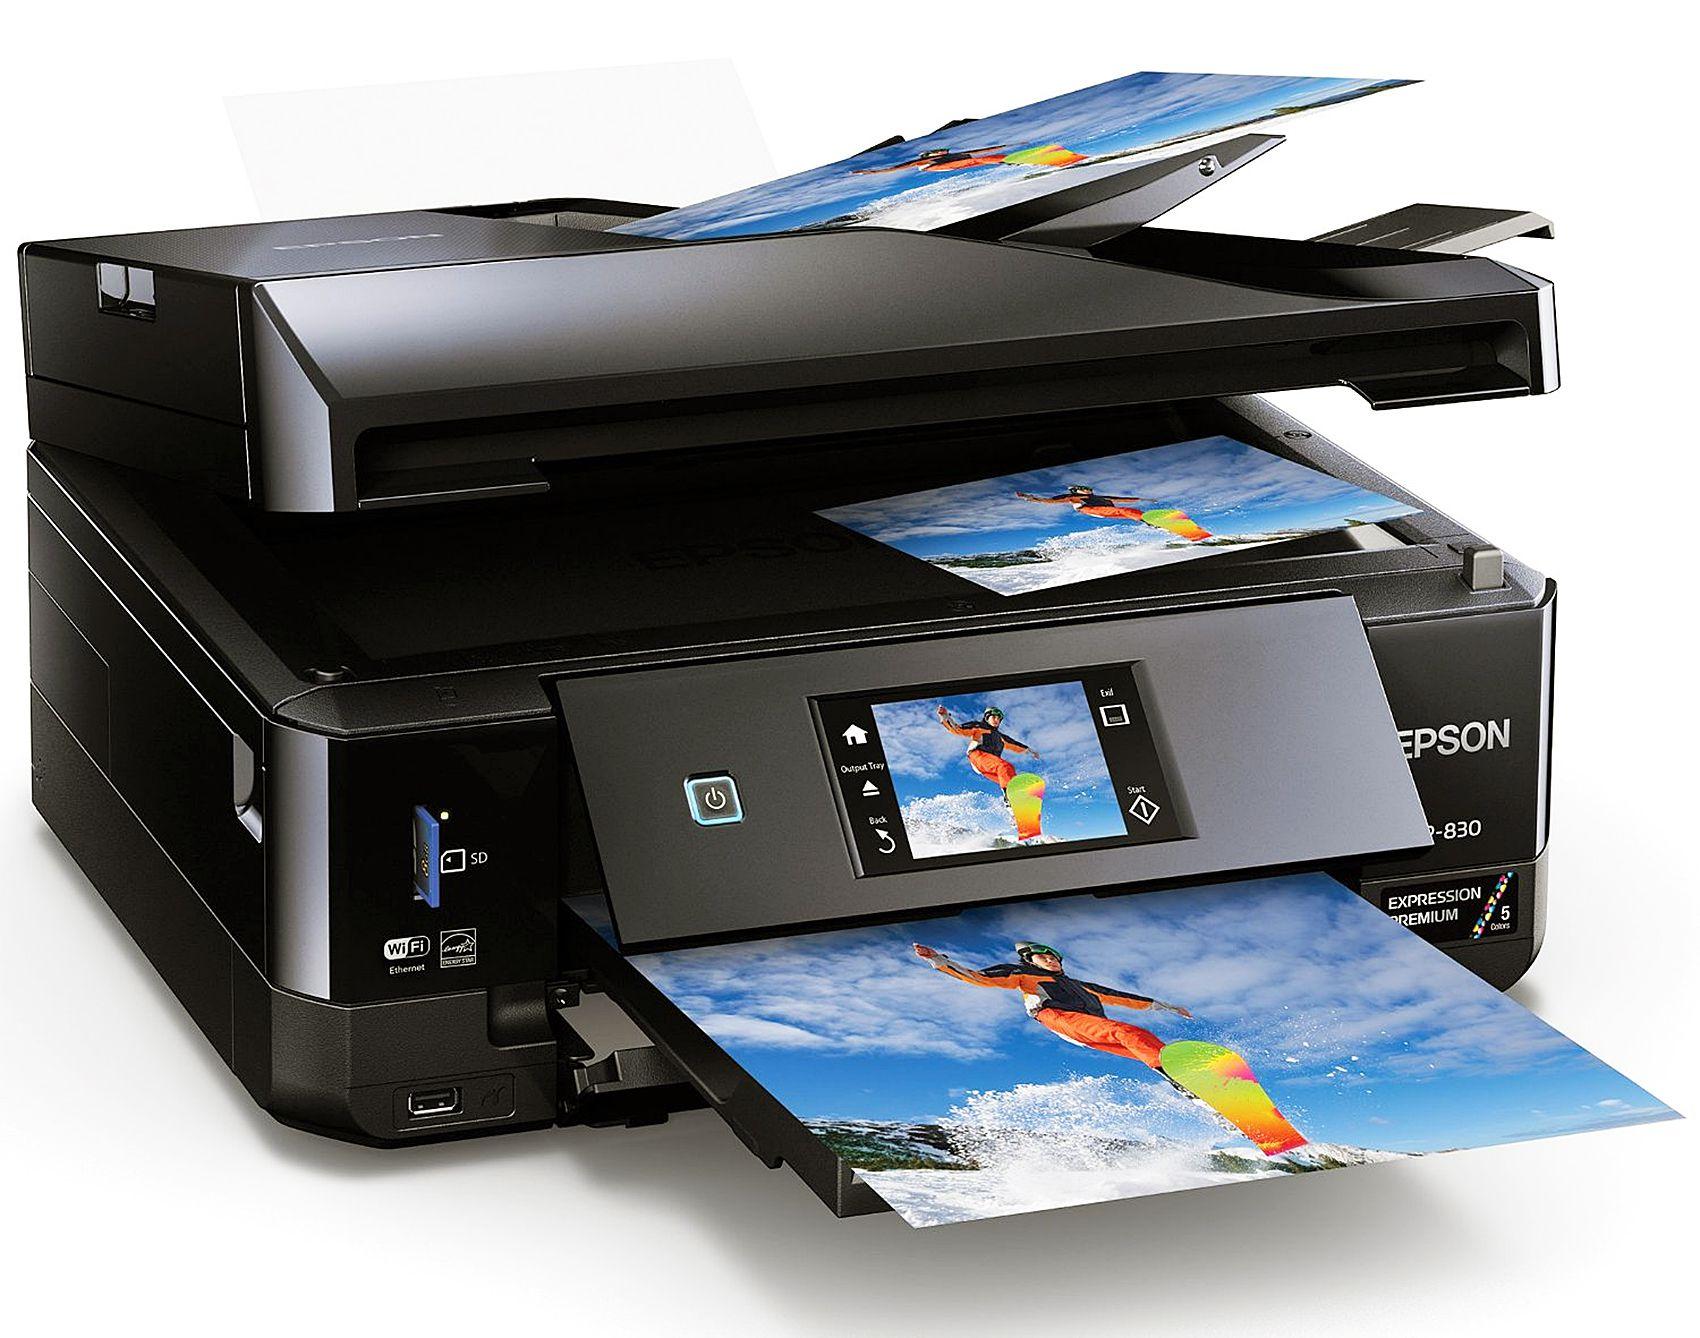 Where To Buy Expression Home Xp  Epson Printer